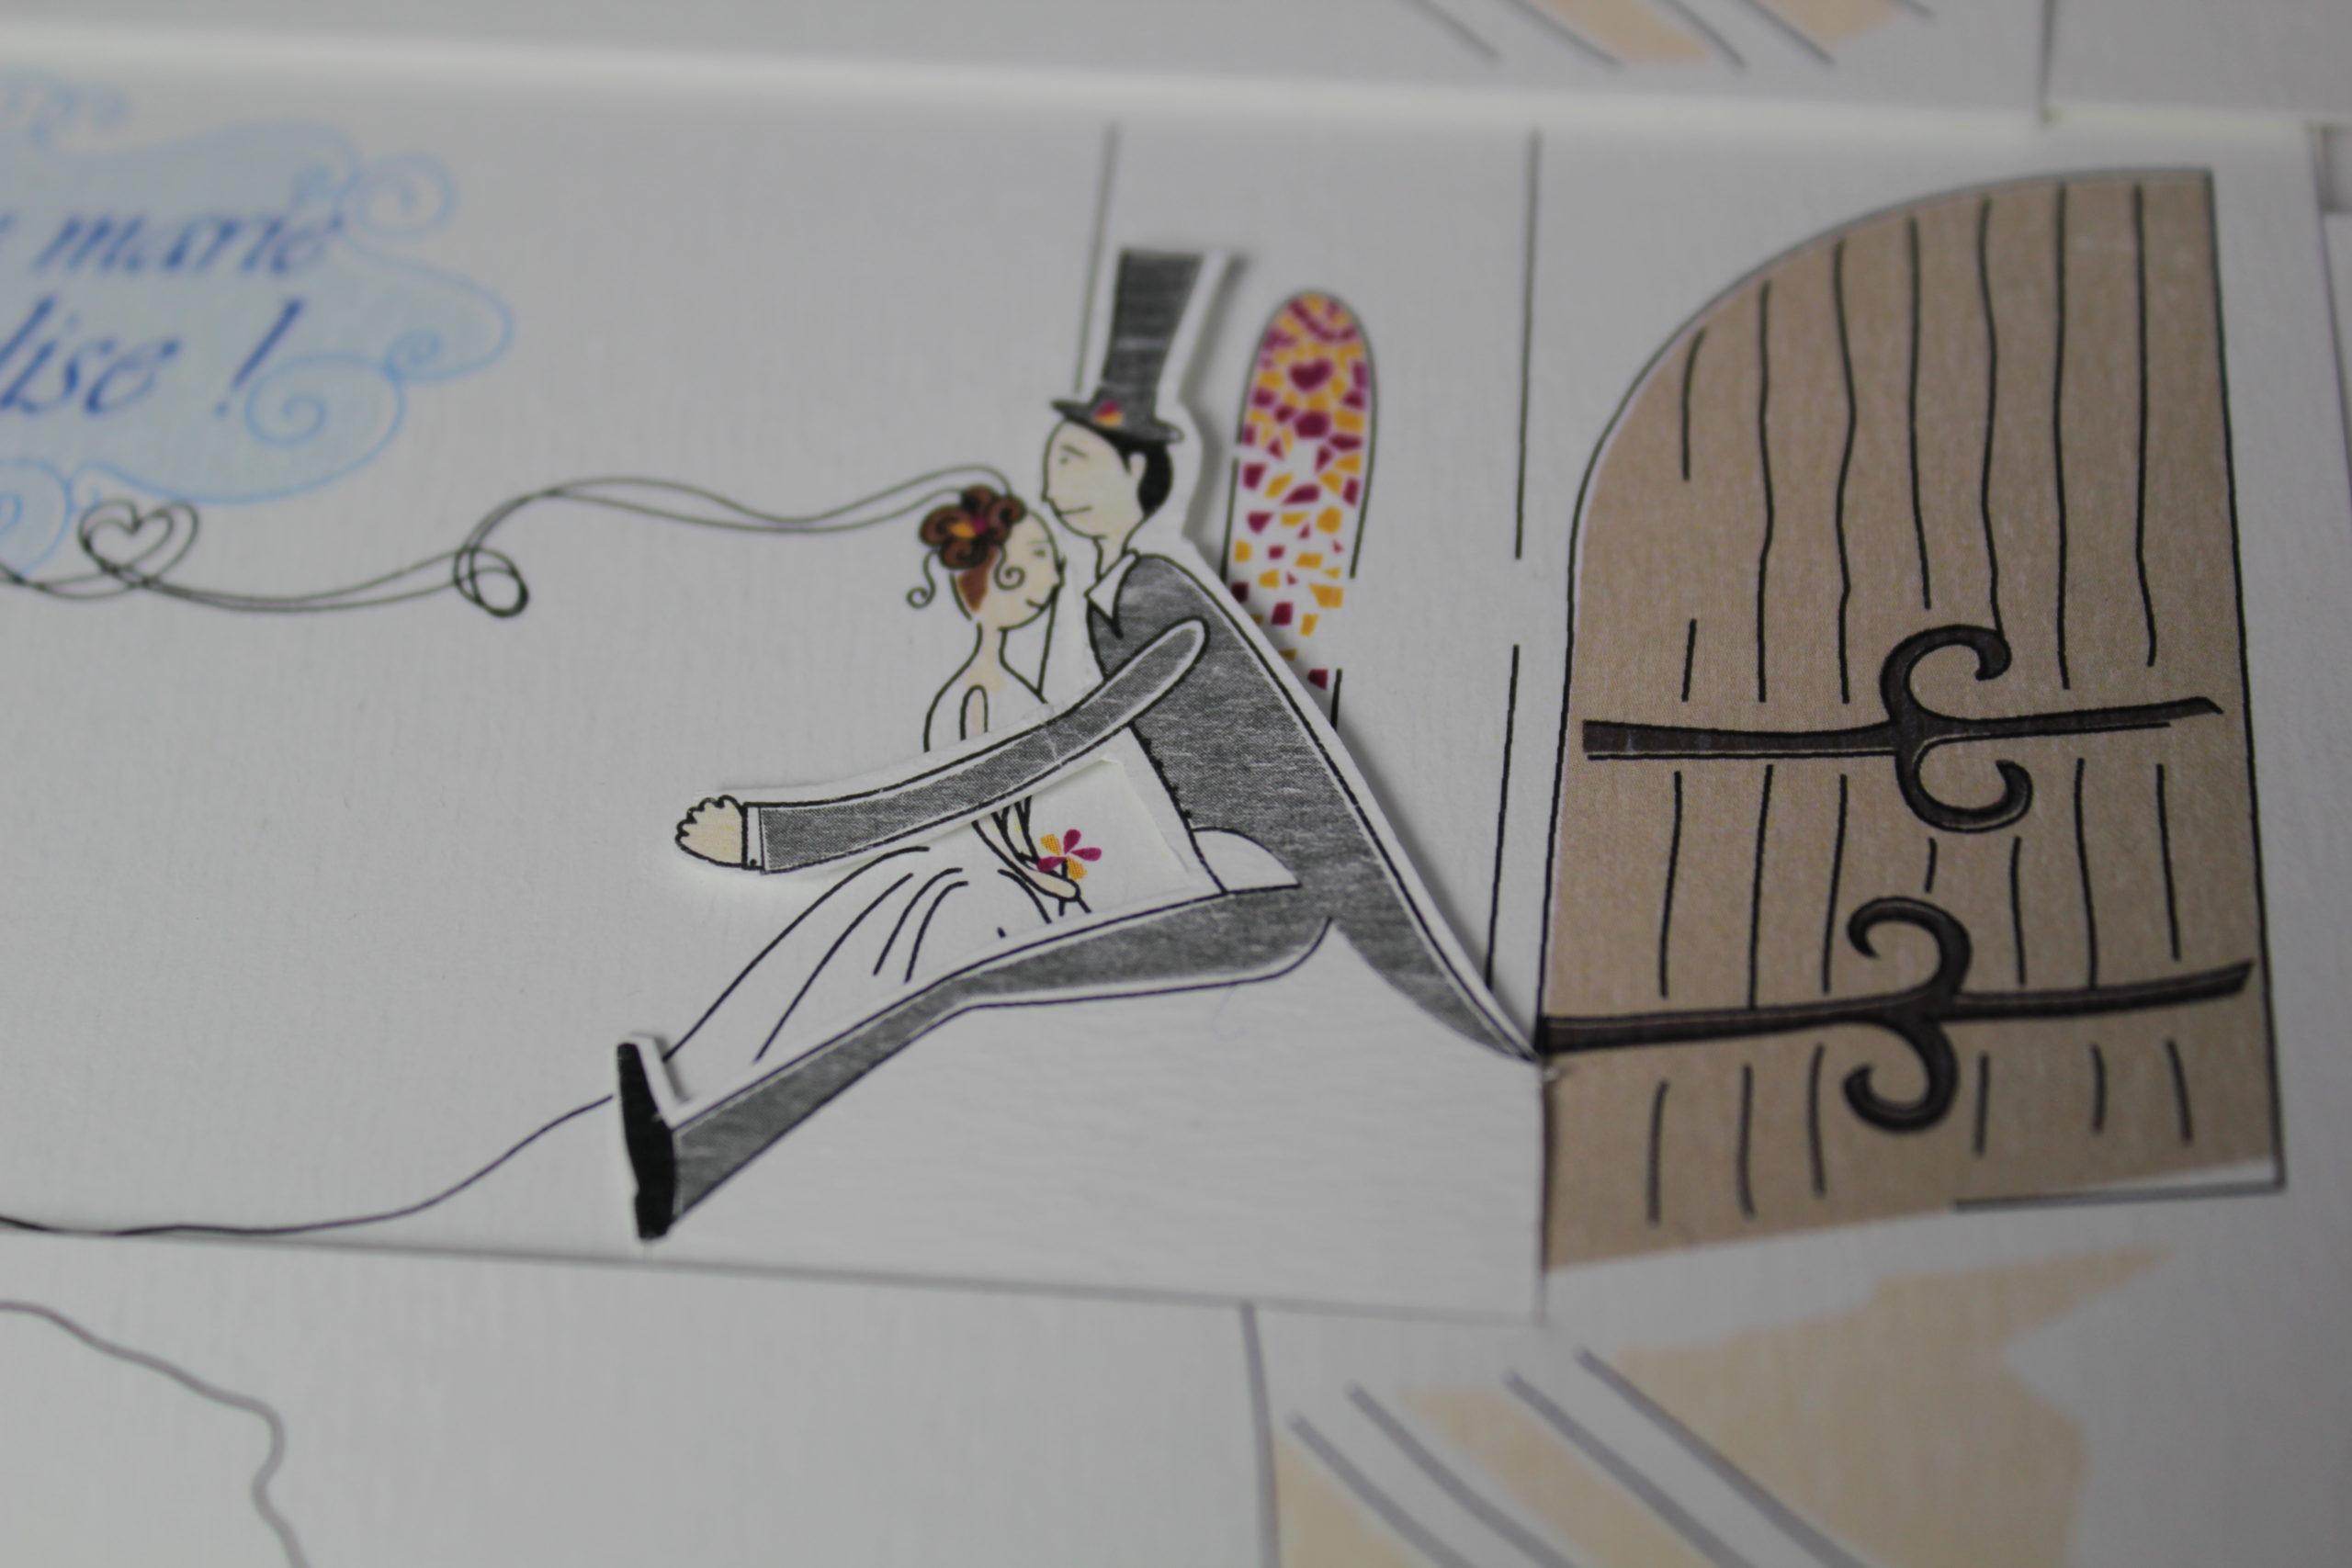 Mariage (animation)